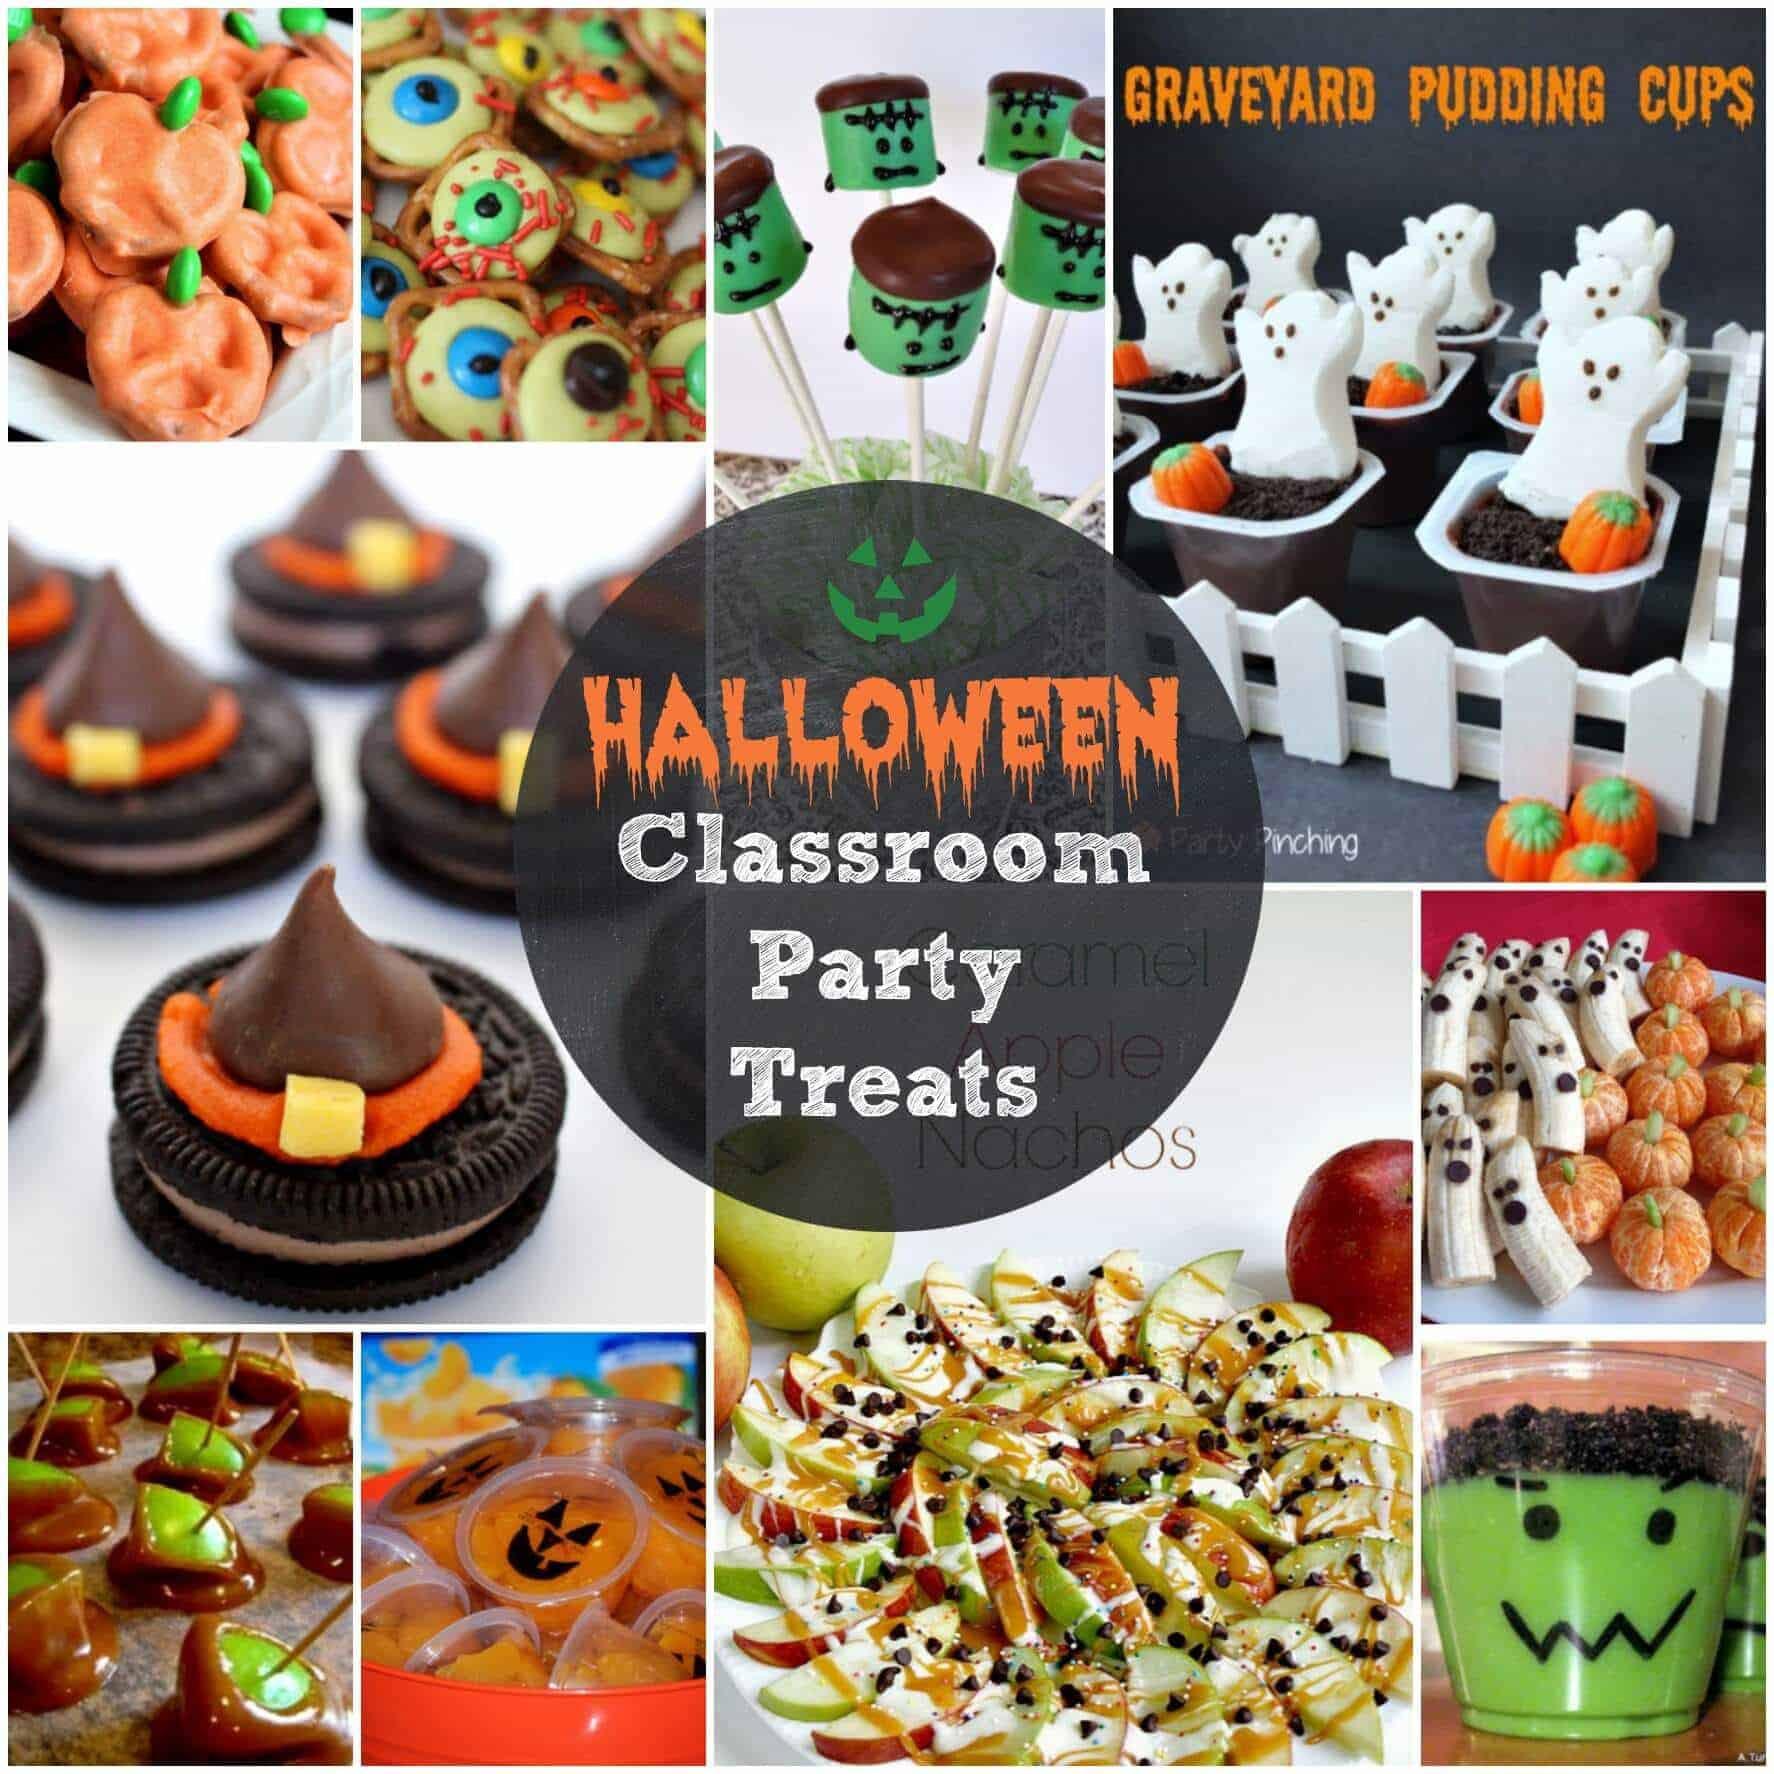 Halloween Healthy Snacks For Classroom  Easy Halloween Treats for Your Classroom Parties Page 2